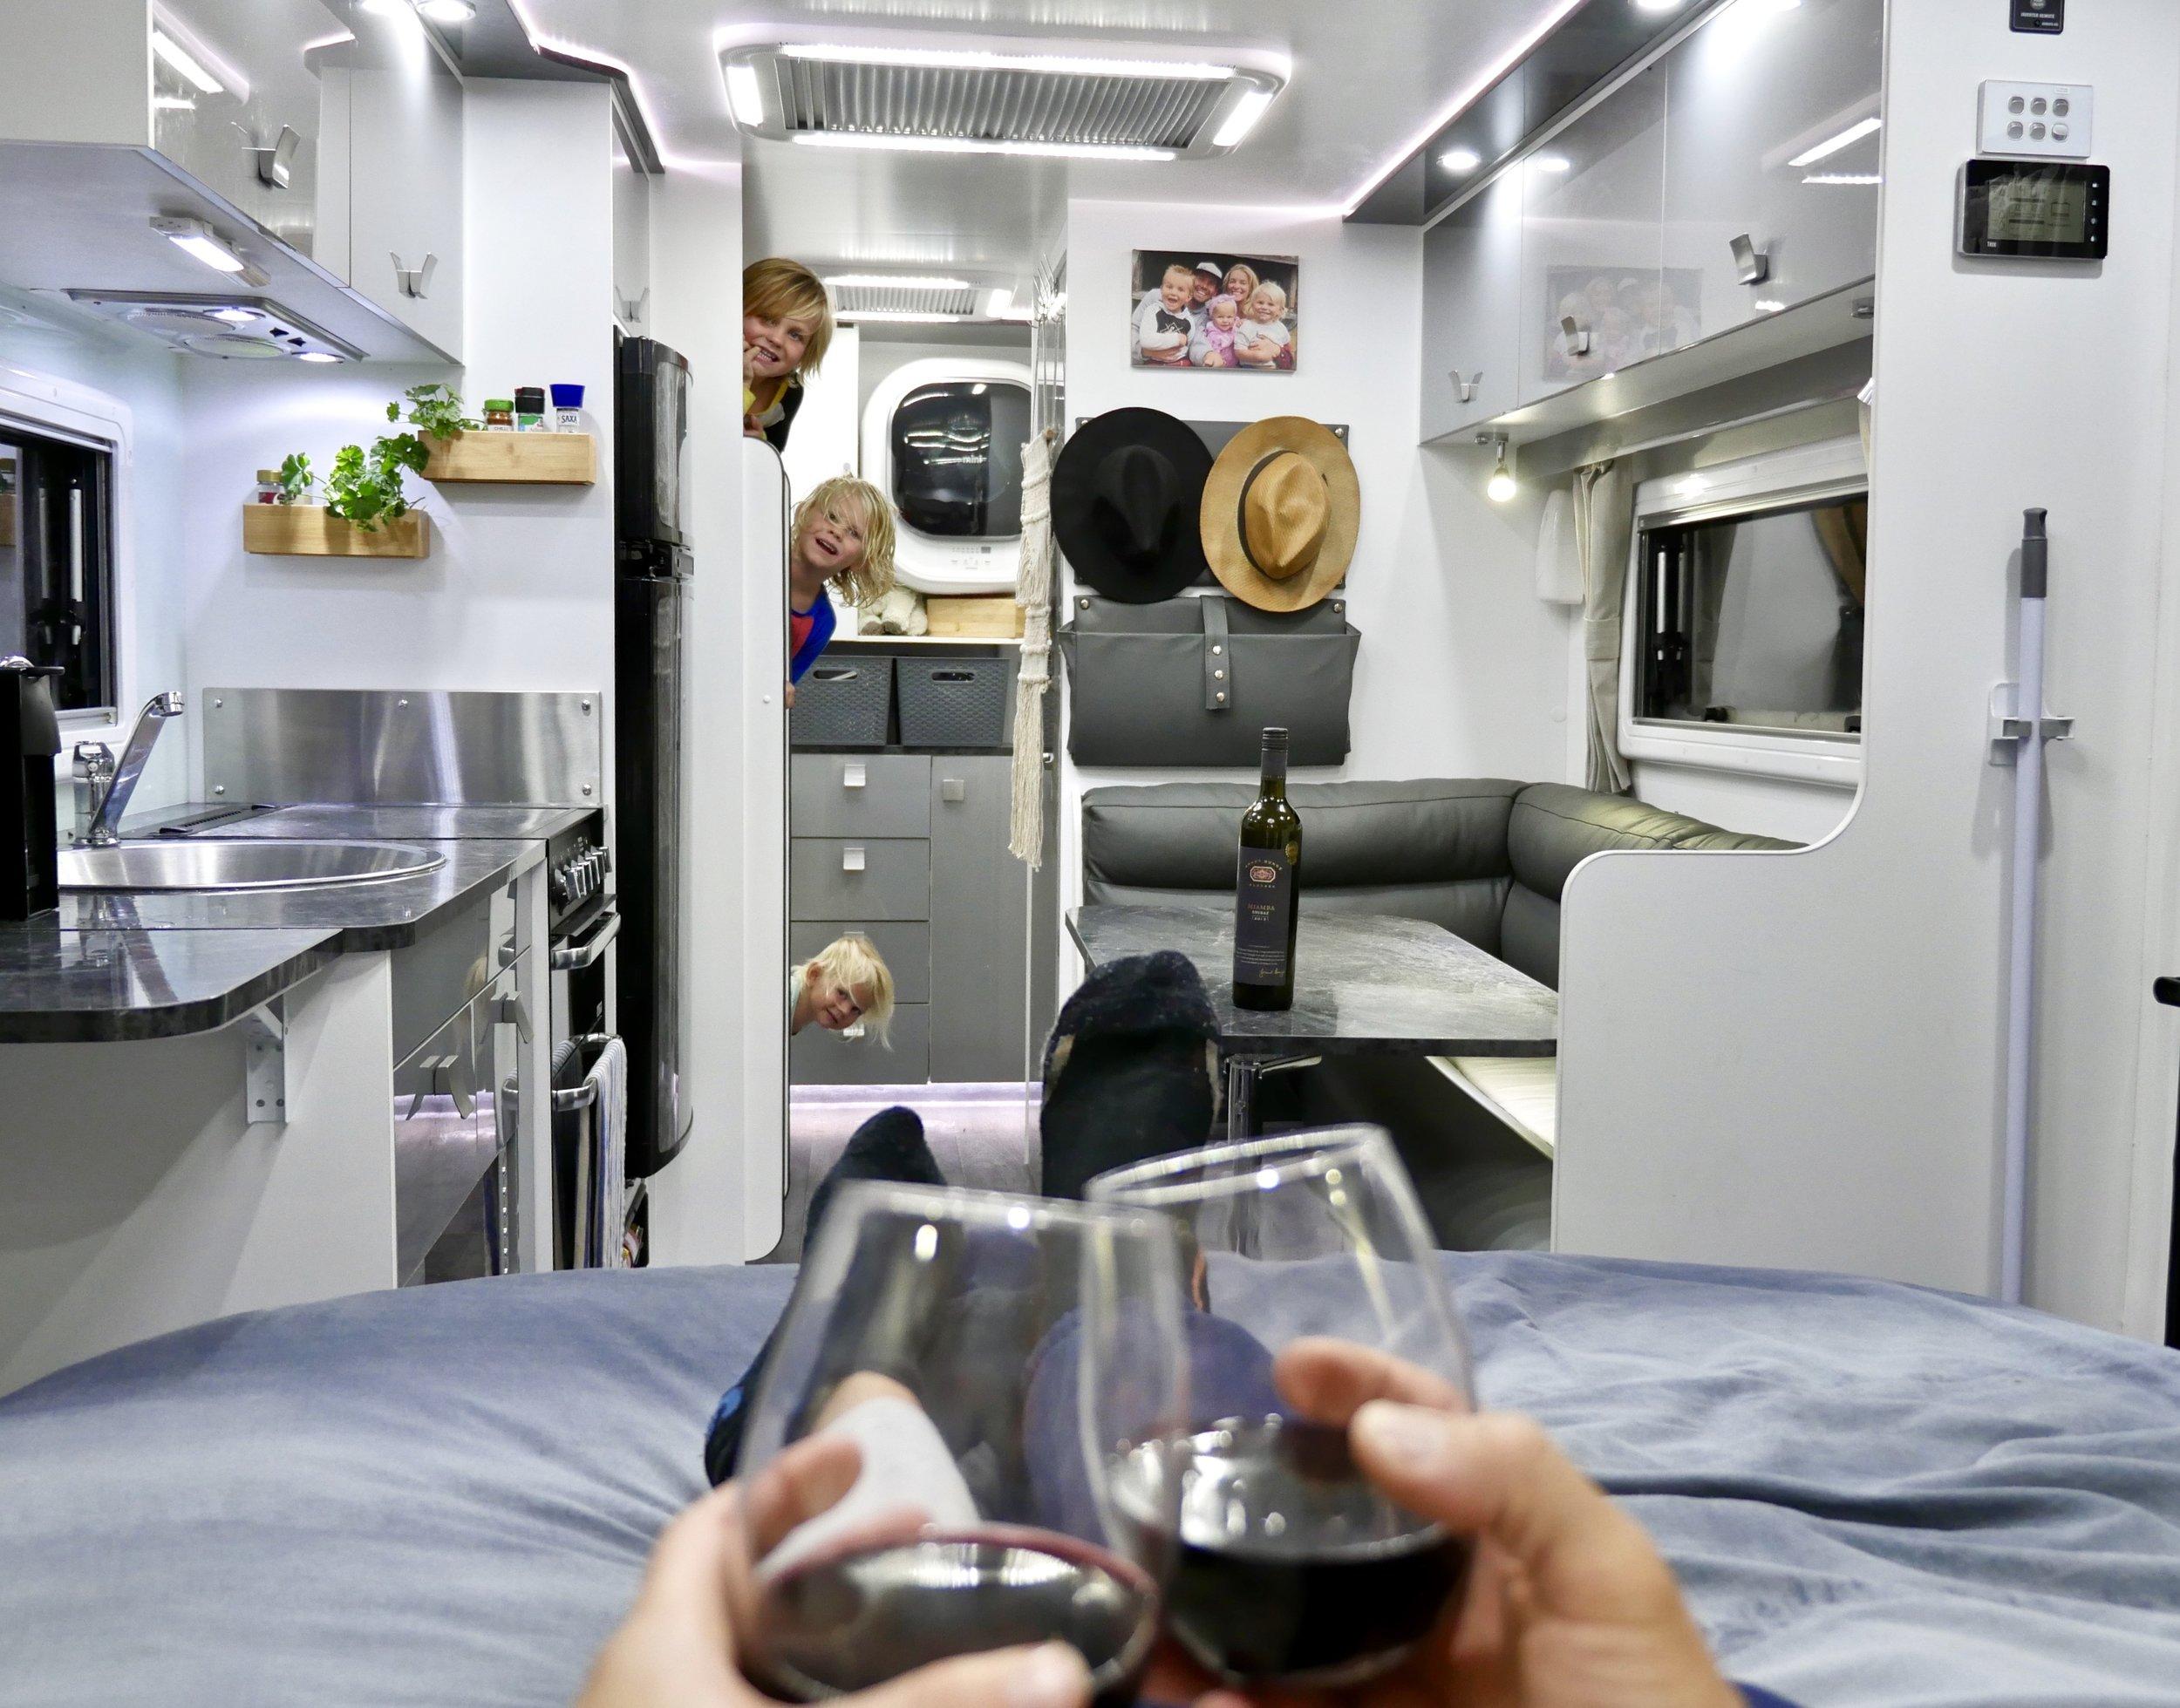 The inside of our second caravan, a Jurgens Solaris.